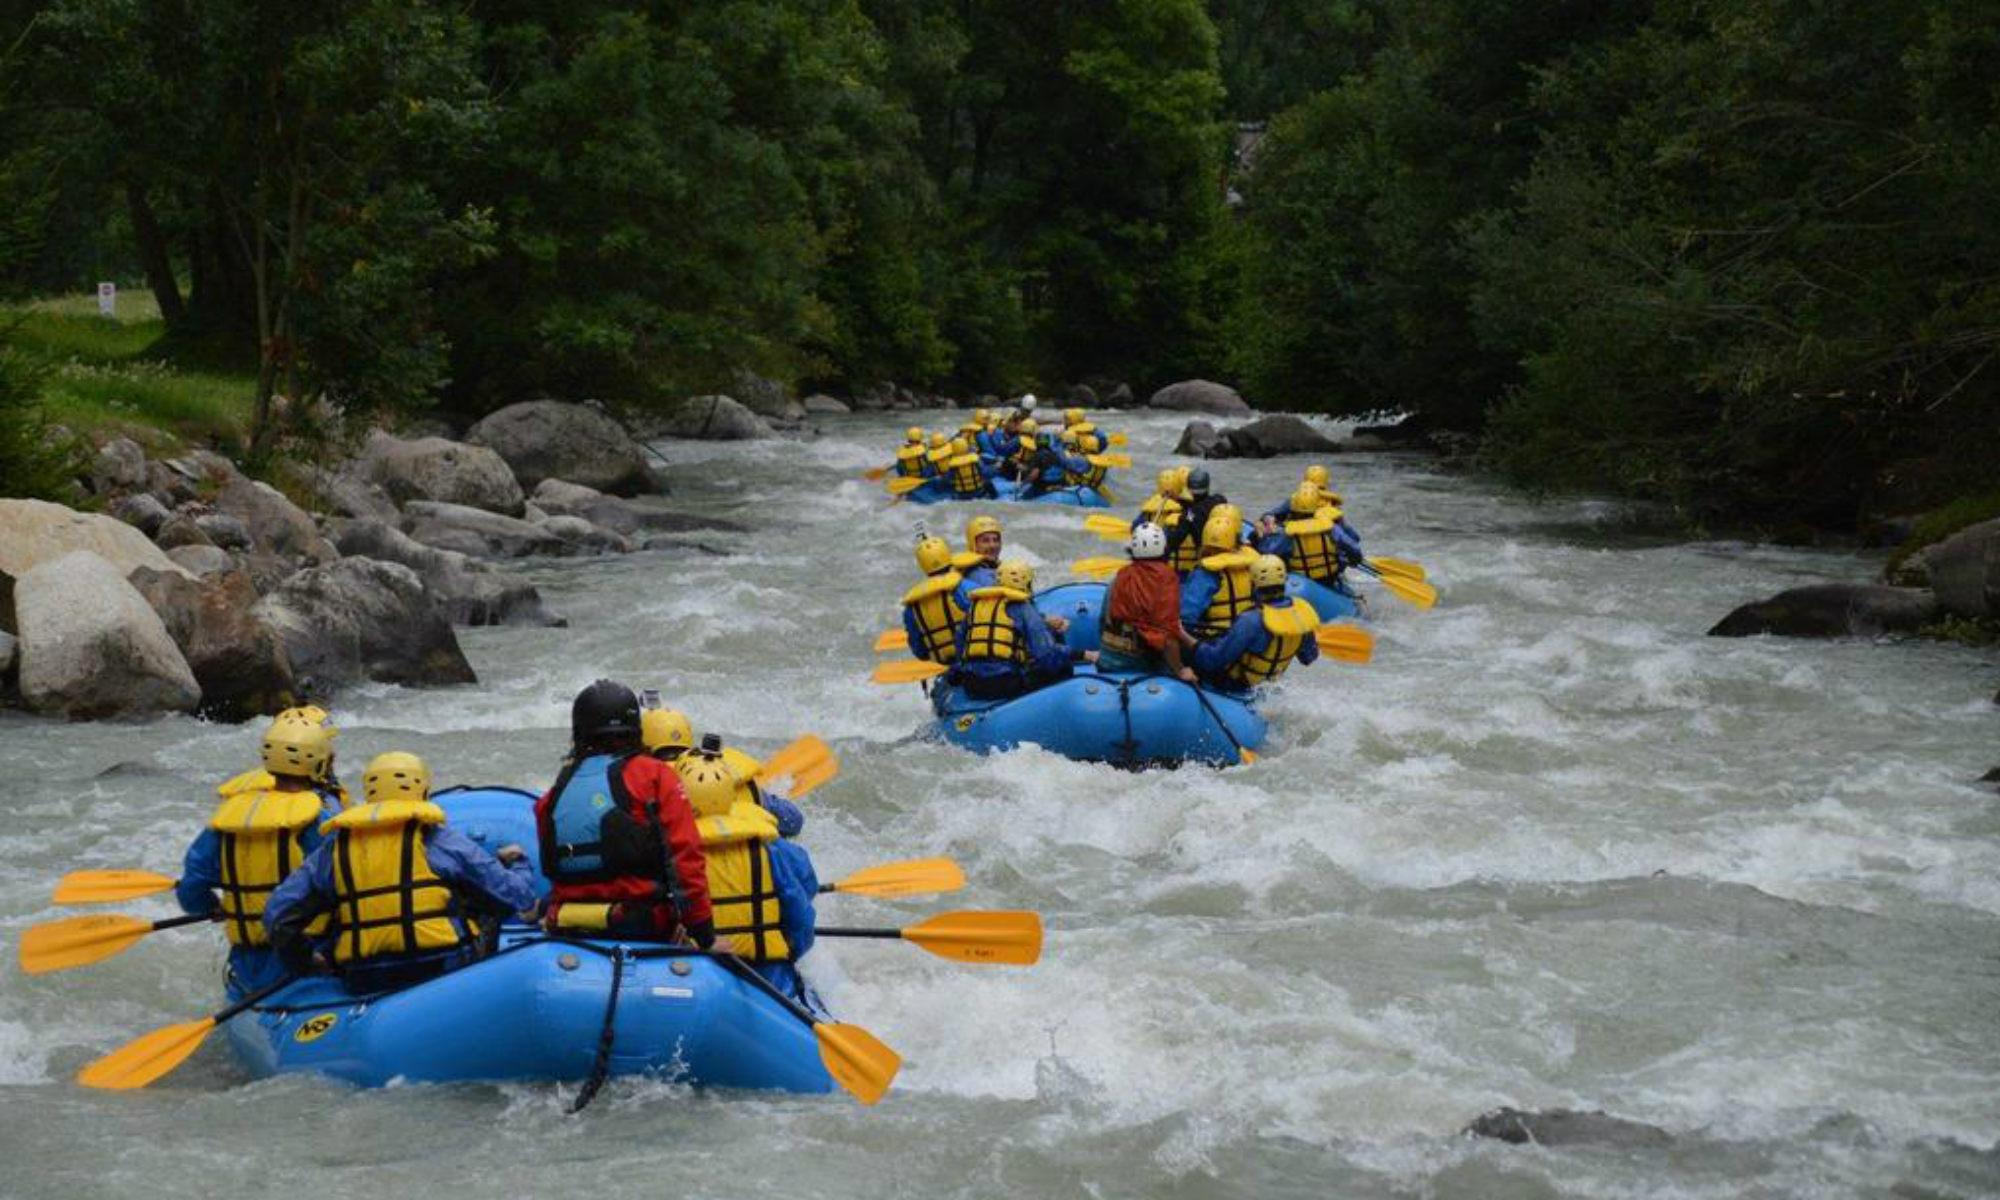 Mehrere Gruppen beim Rafting am Fluss Noce in Val di Sole.